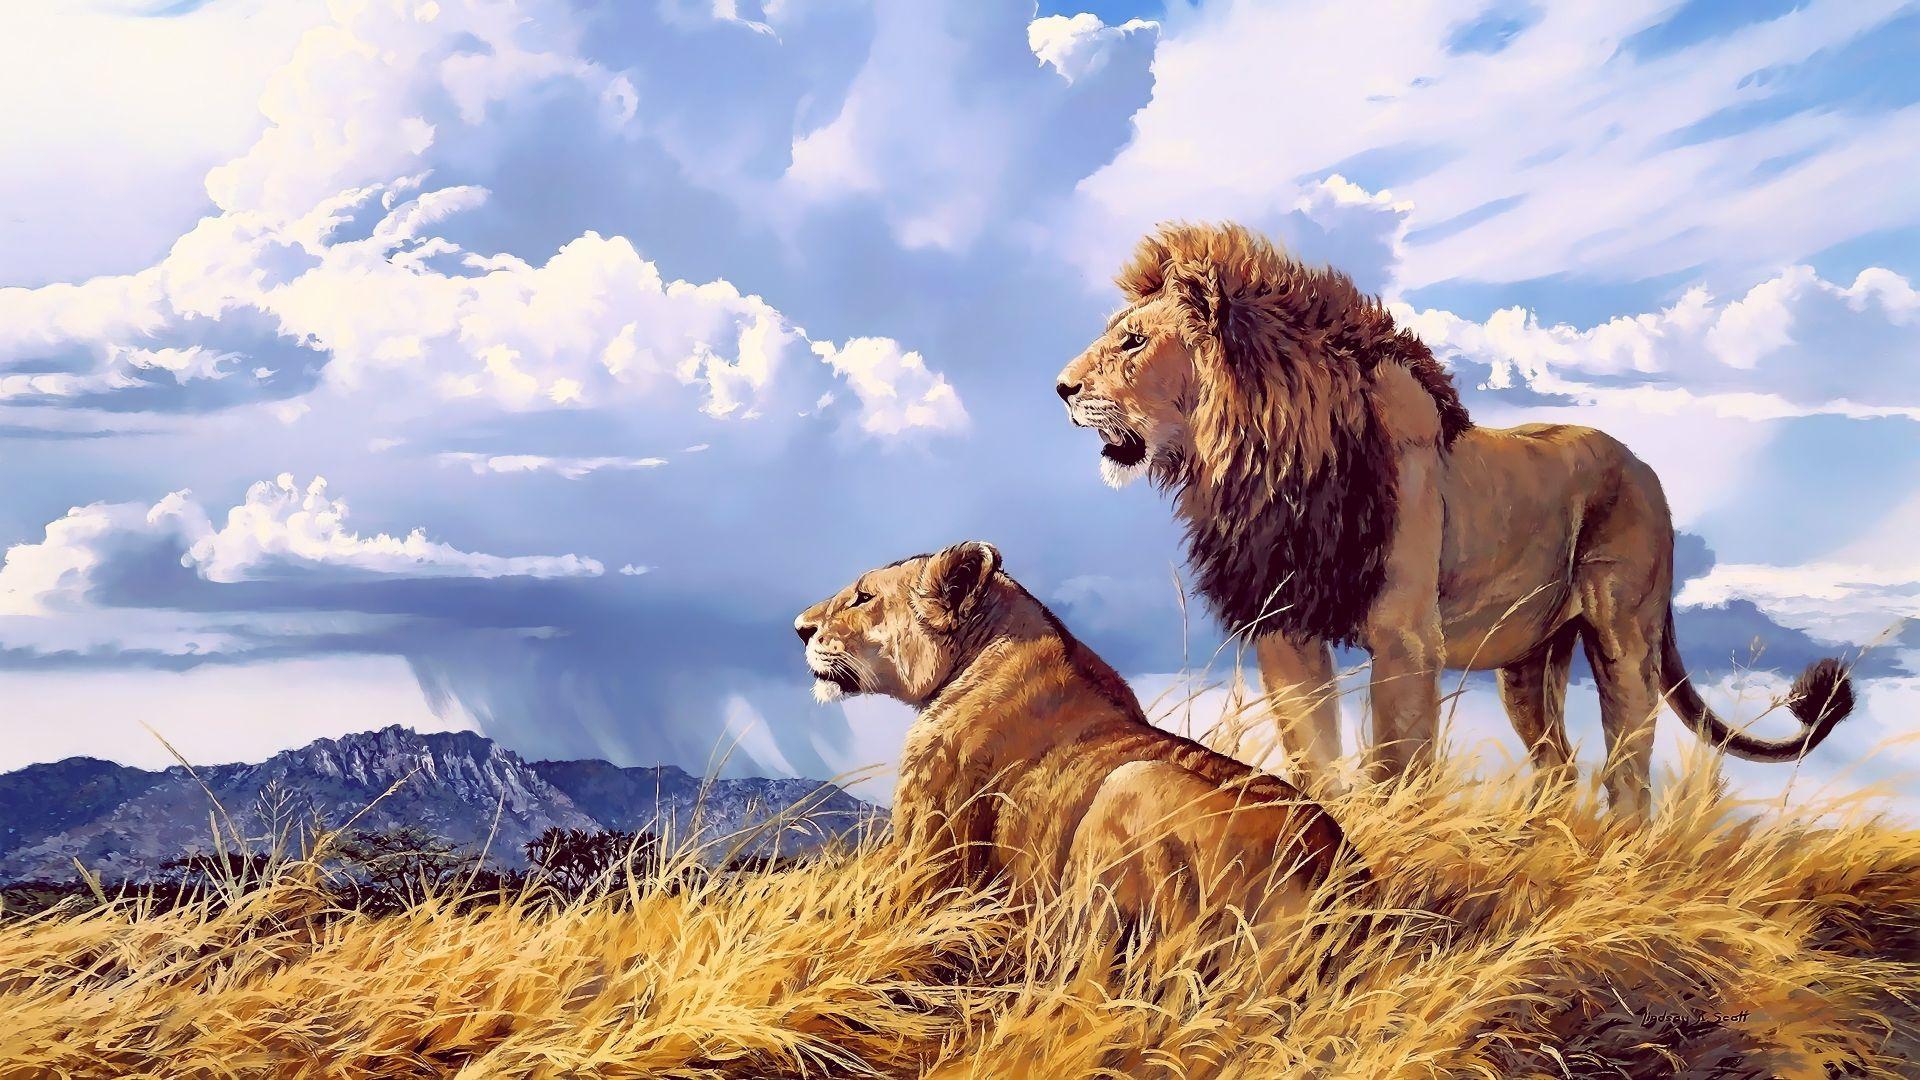 Desktop Wallpaper Lions Beast Animal Pair 4k Hd Image